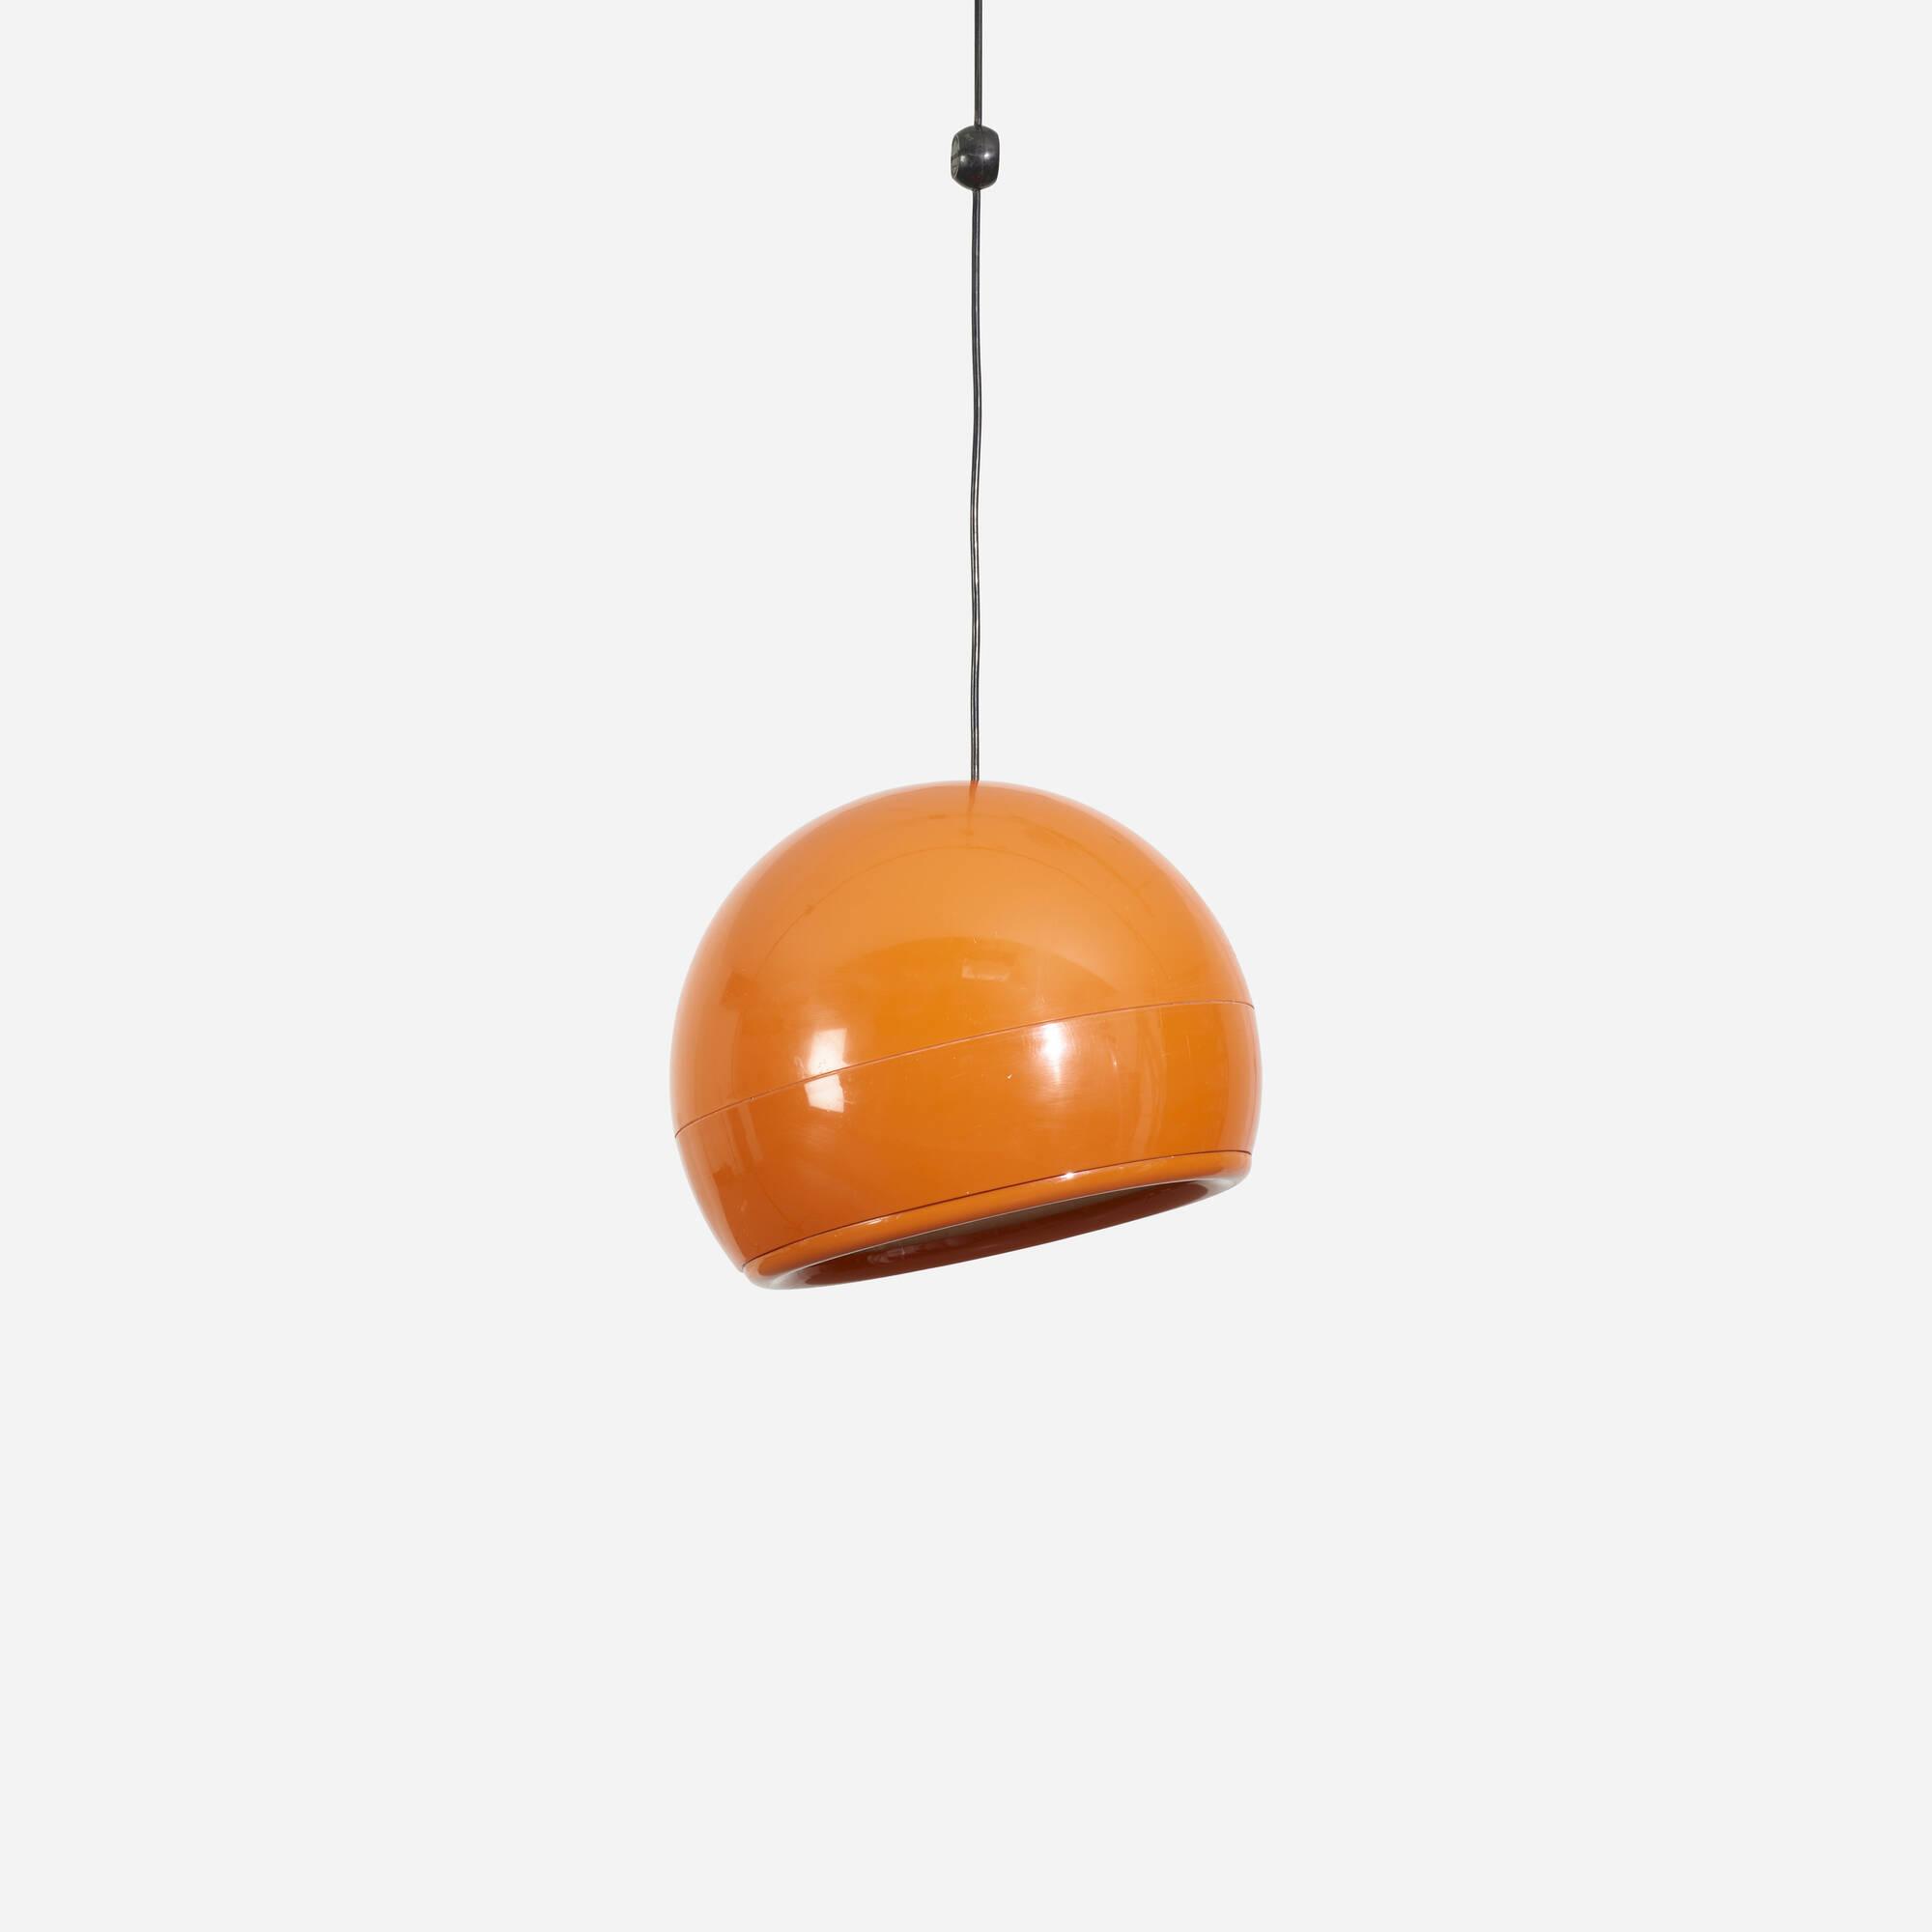 332: Studio Tetrarch / Pallade pendant lamp (1 of 2)